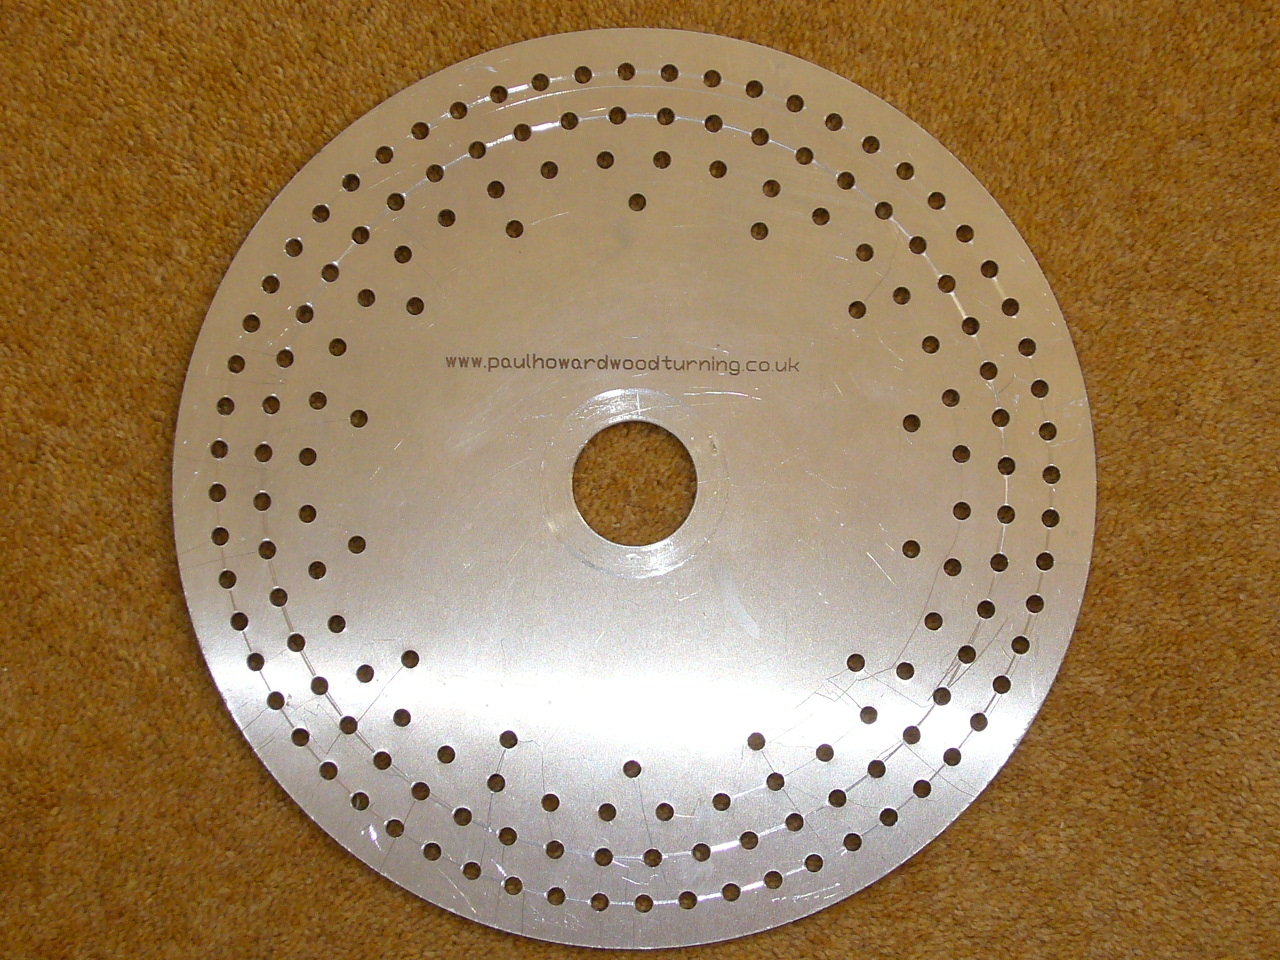 Index Plate